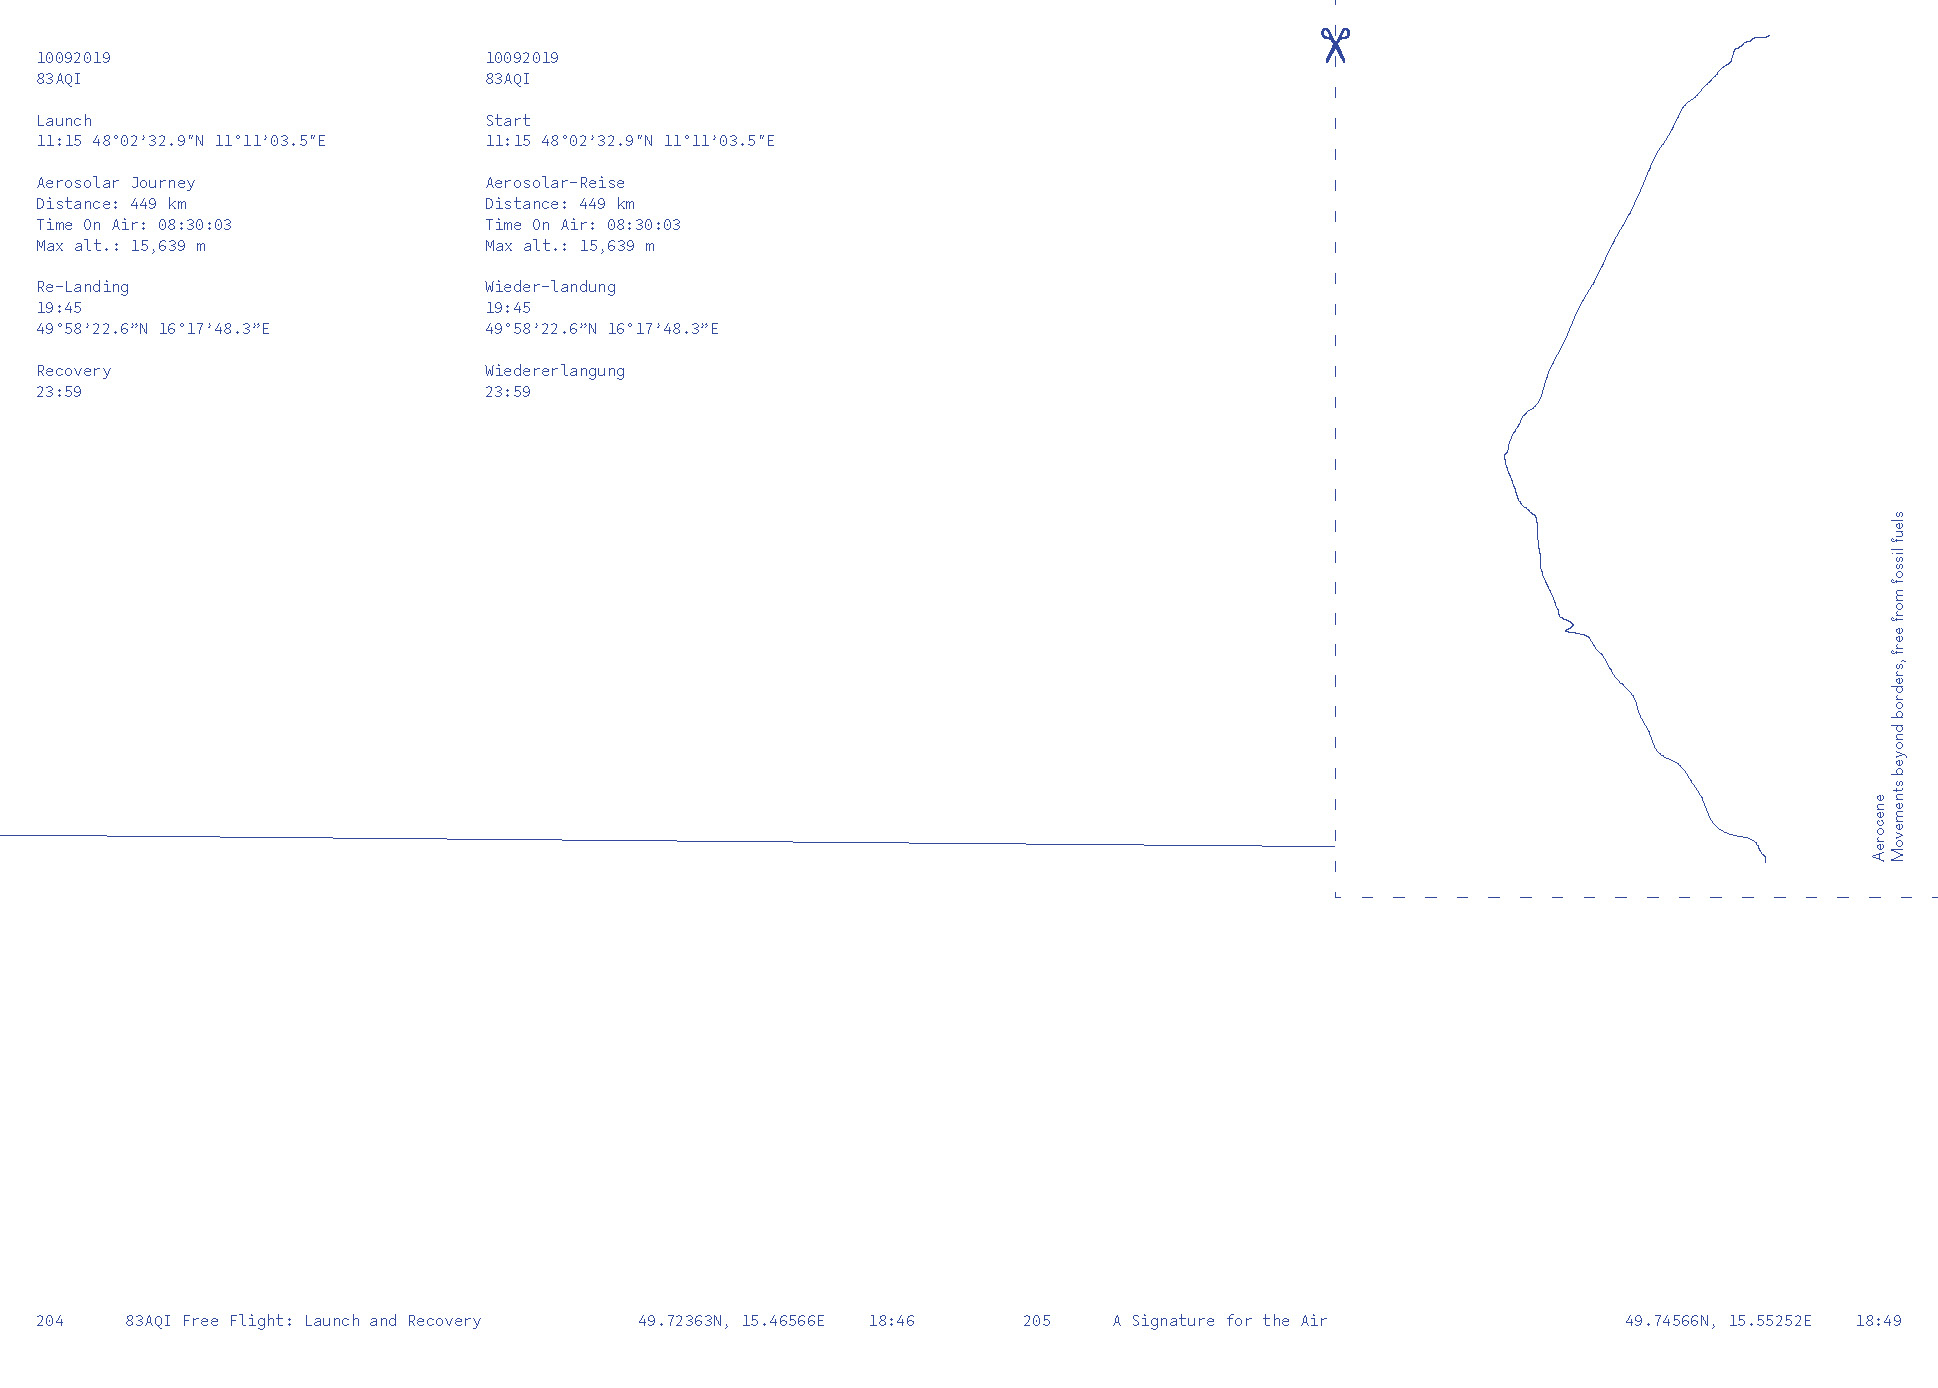 20AE_MovementsfortheAir_Aerocene (1)_Page_103